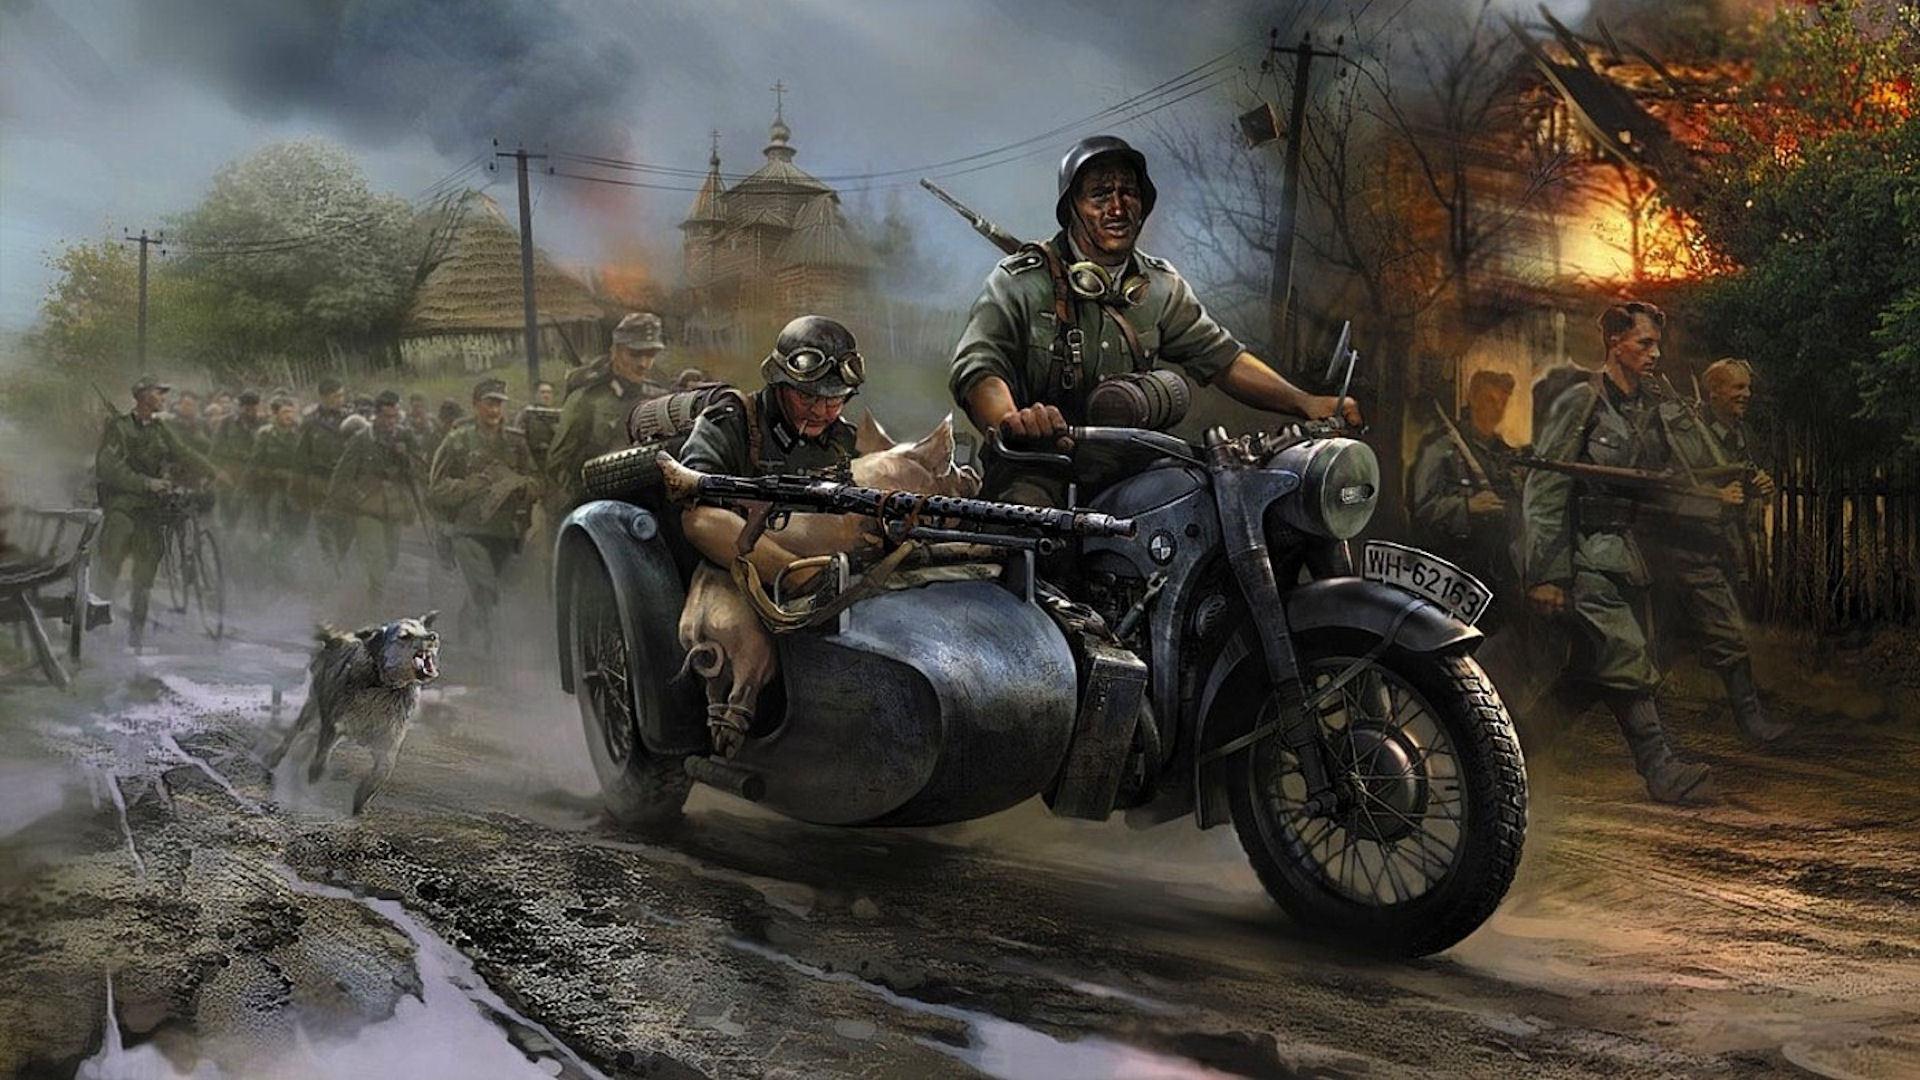 German vehicles motorbikes motorcycles military wars ...